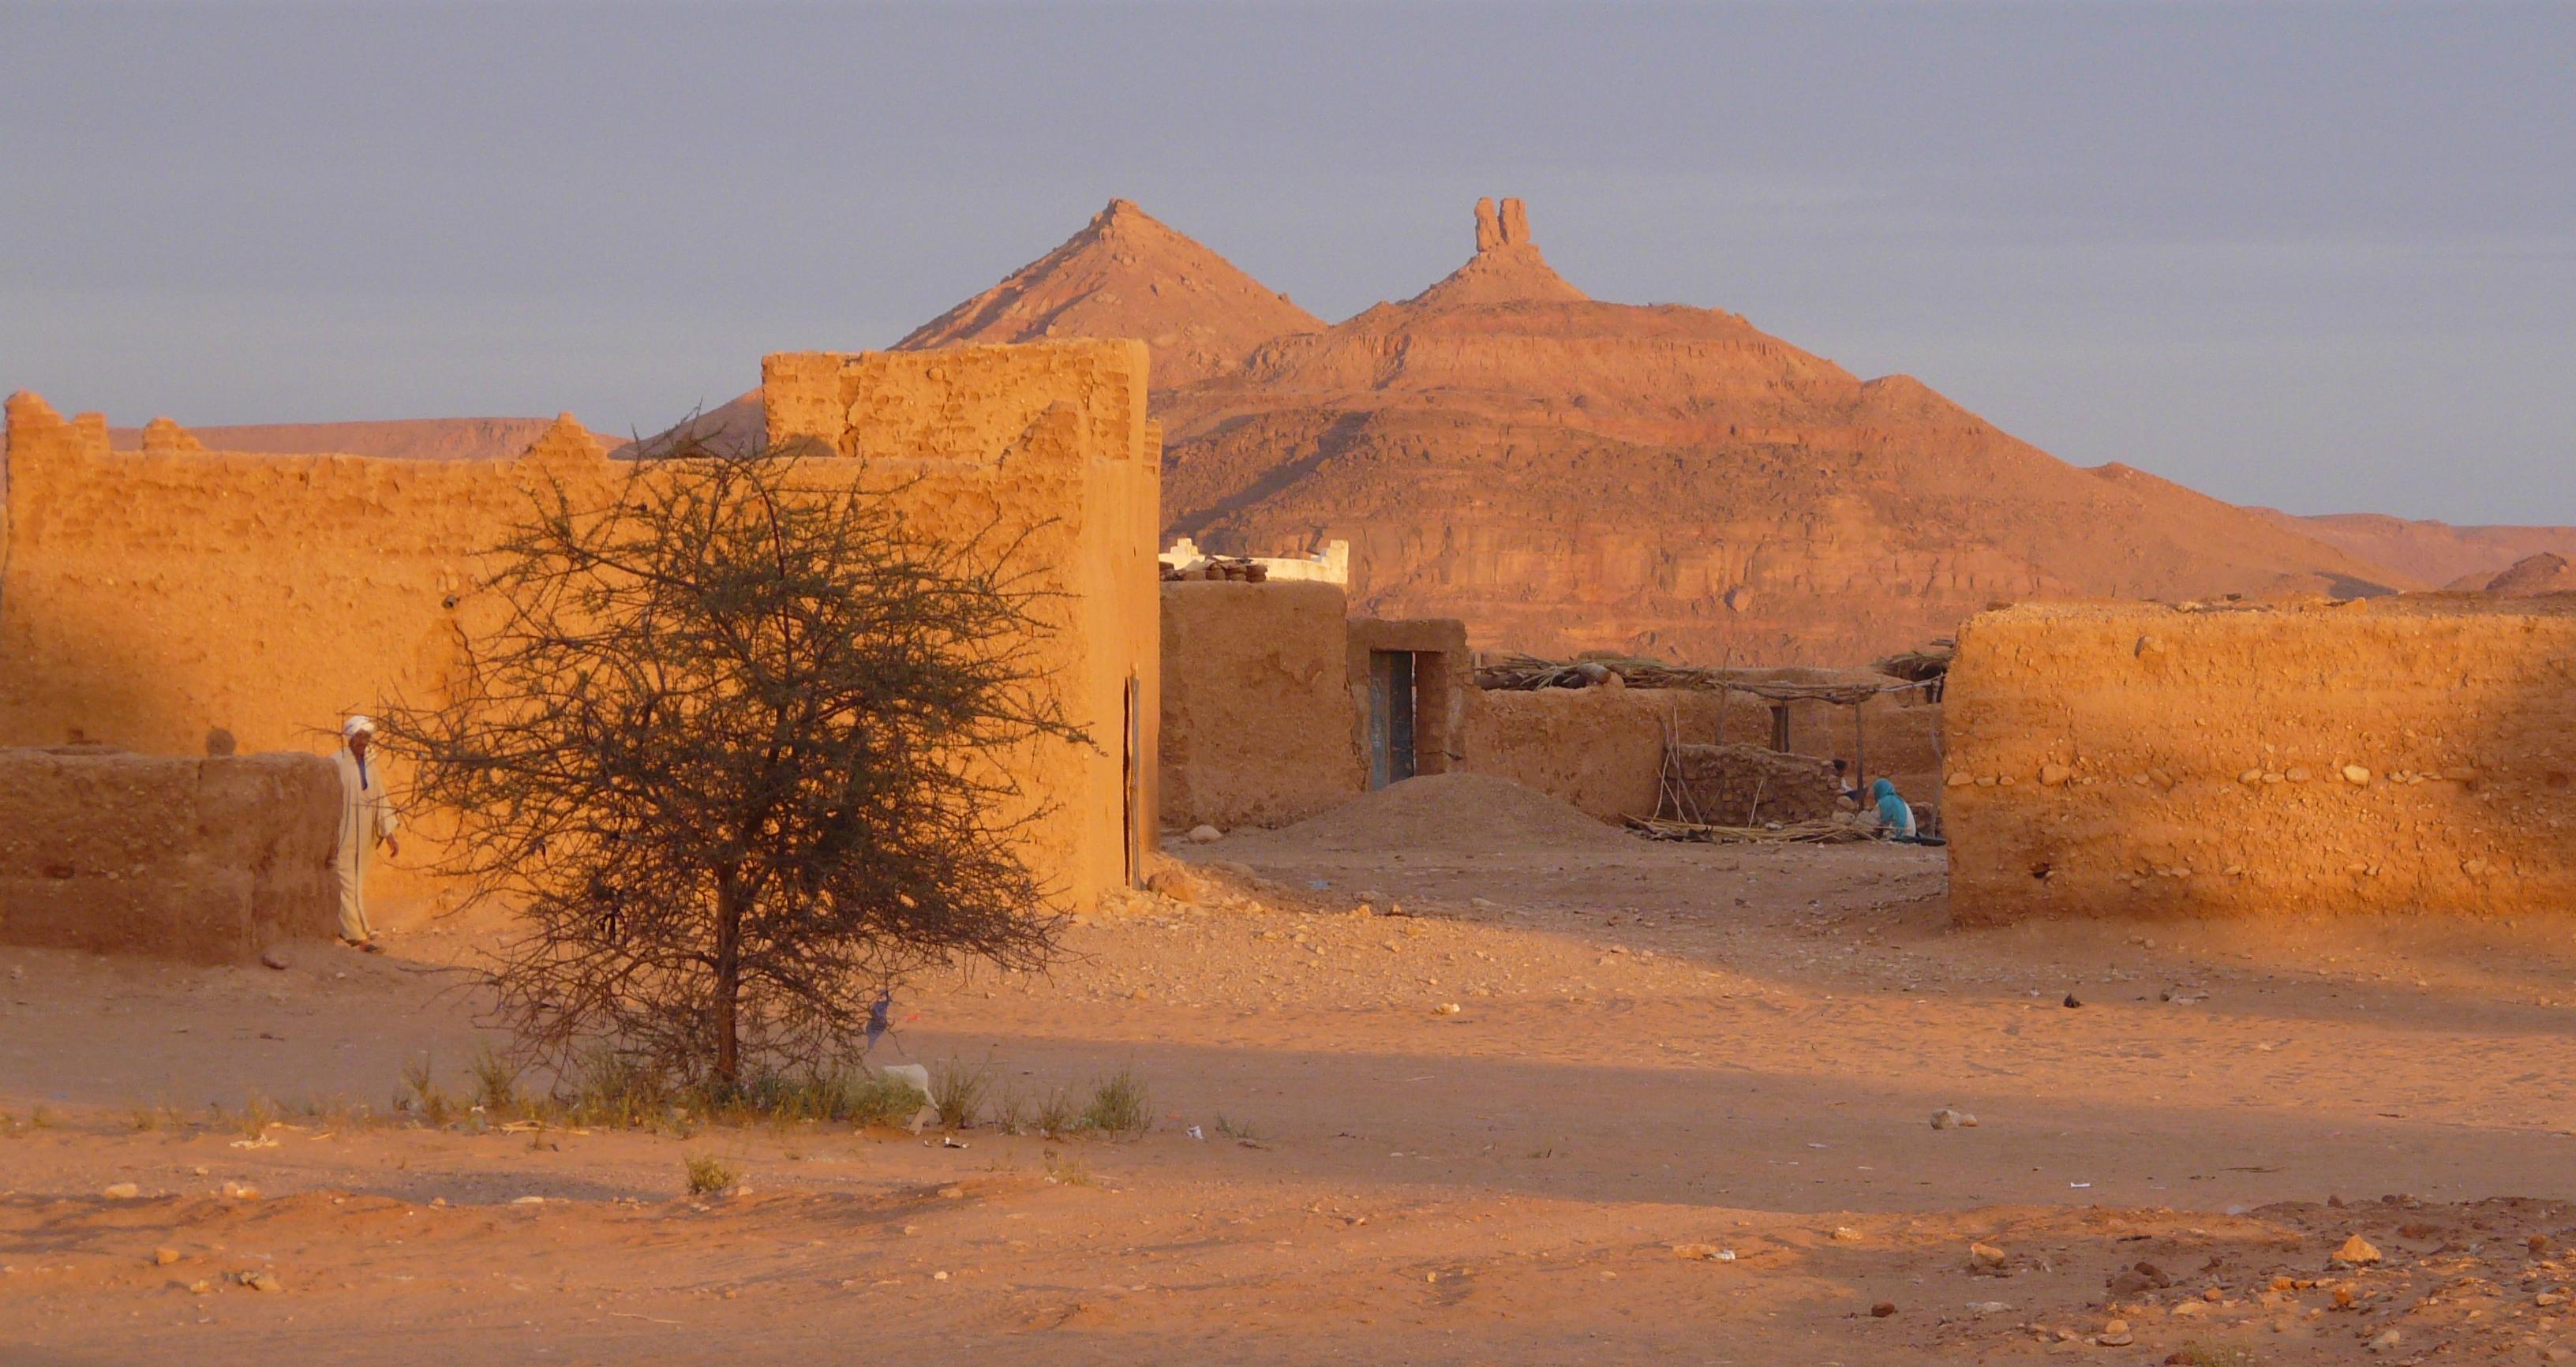 Ramlia-marruecos